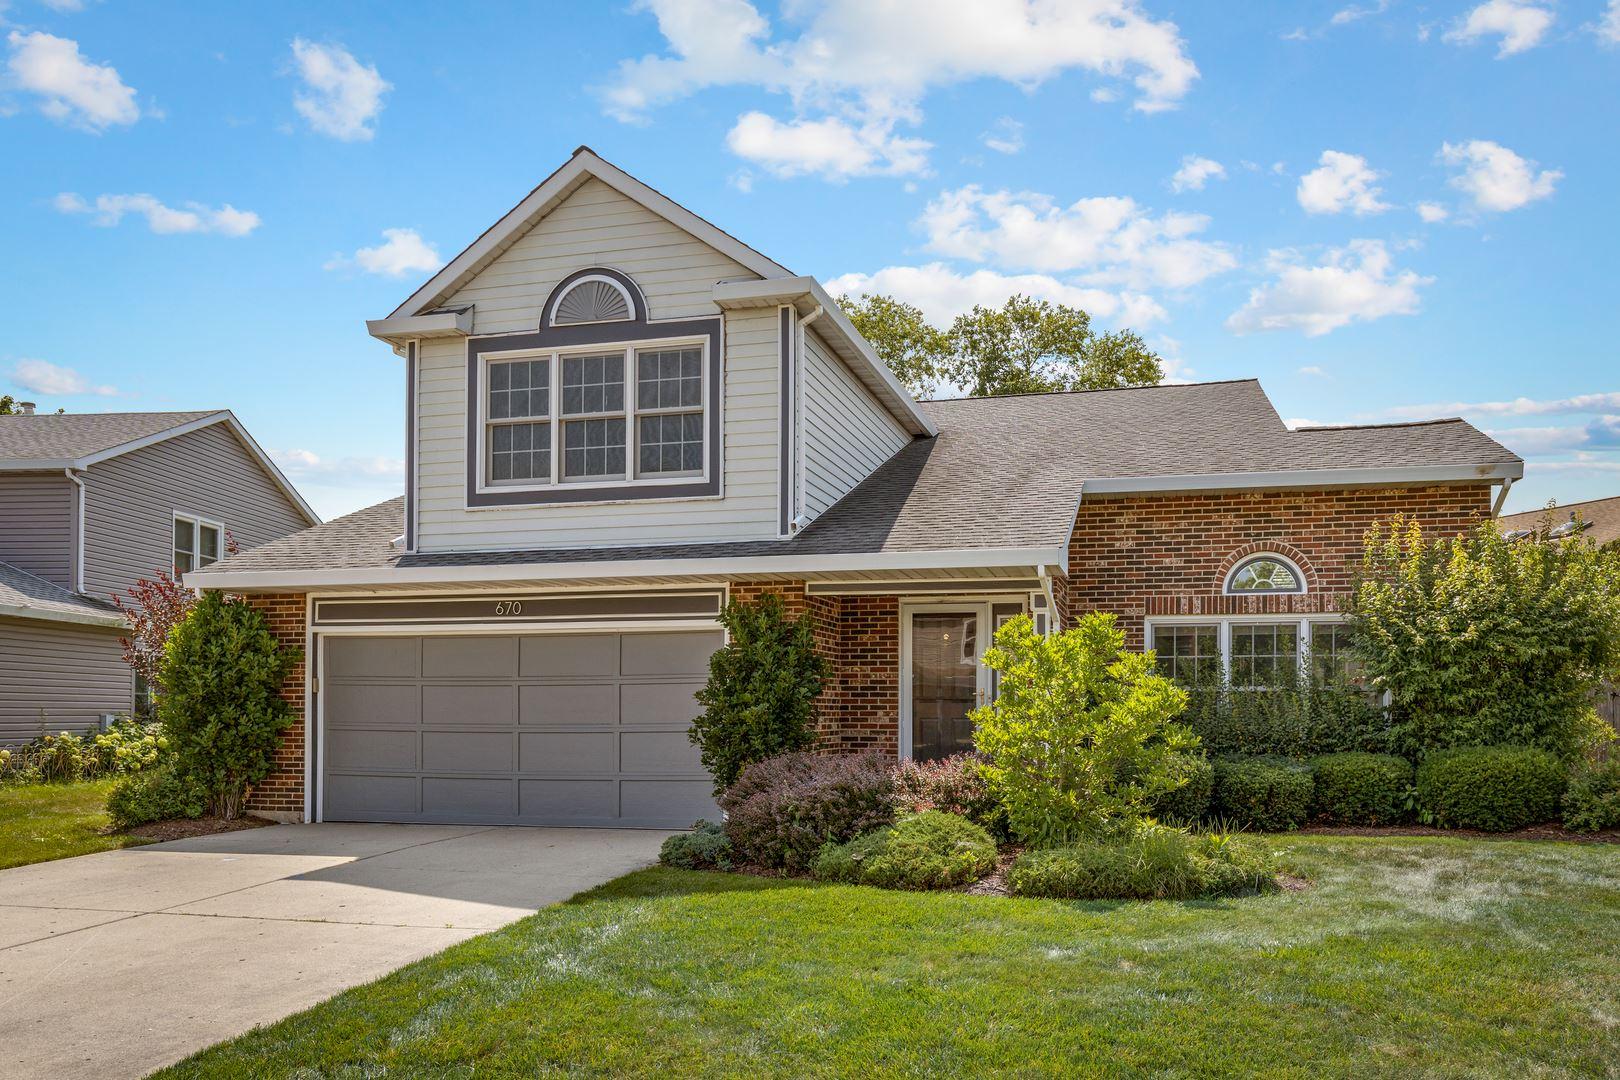 670 YARDLEY Lane, Hoffman Estates, IL 60169 - #: 11172138